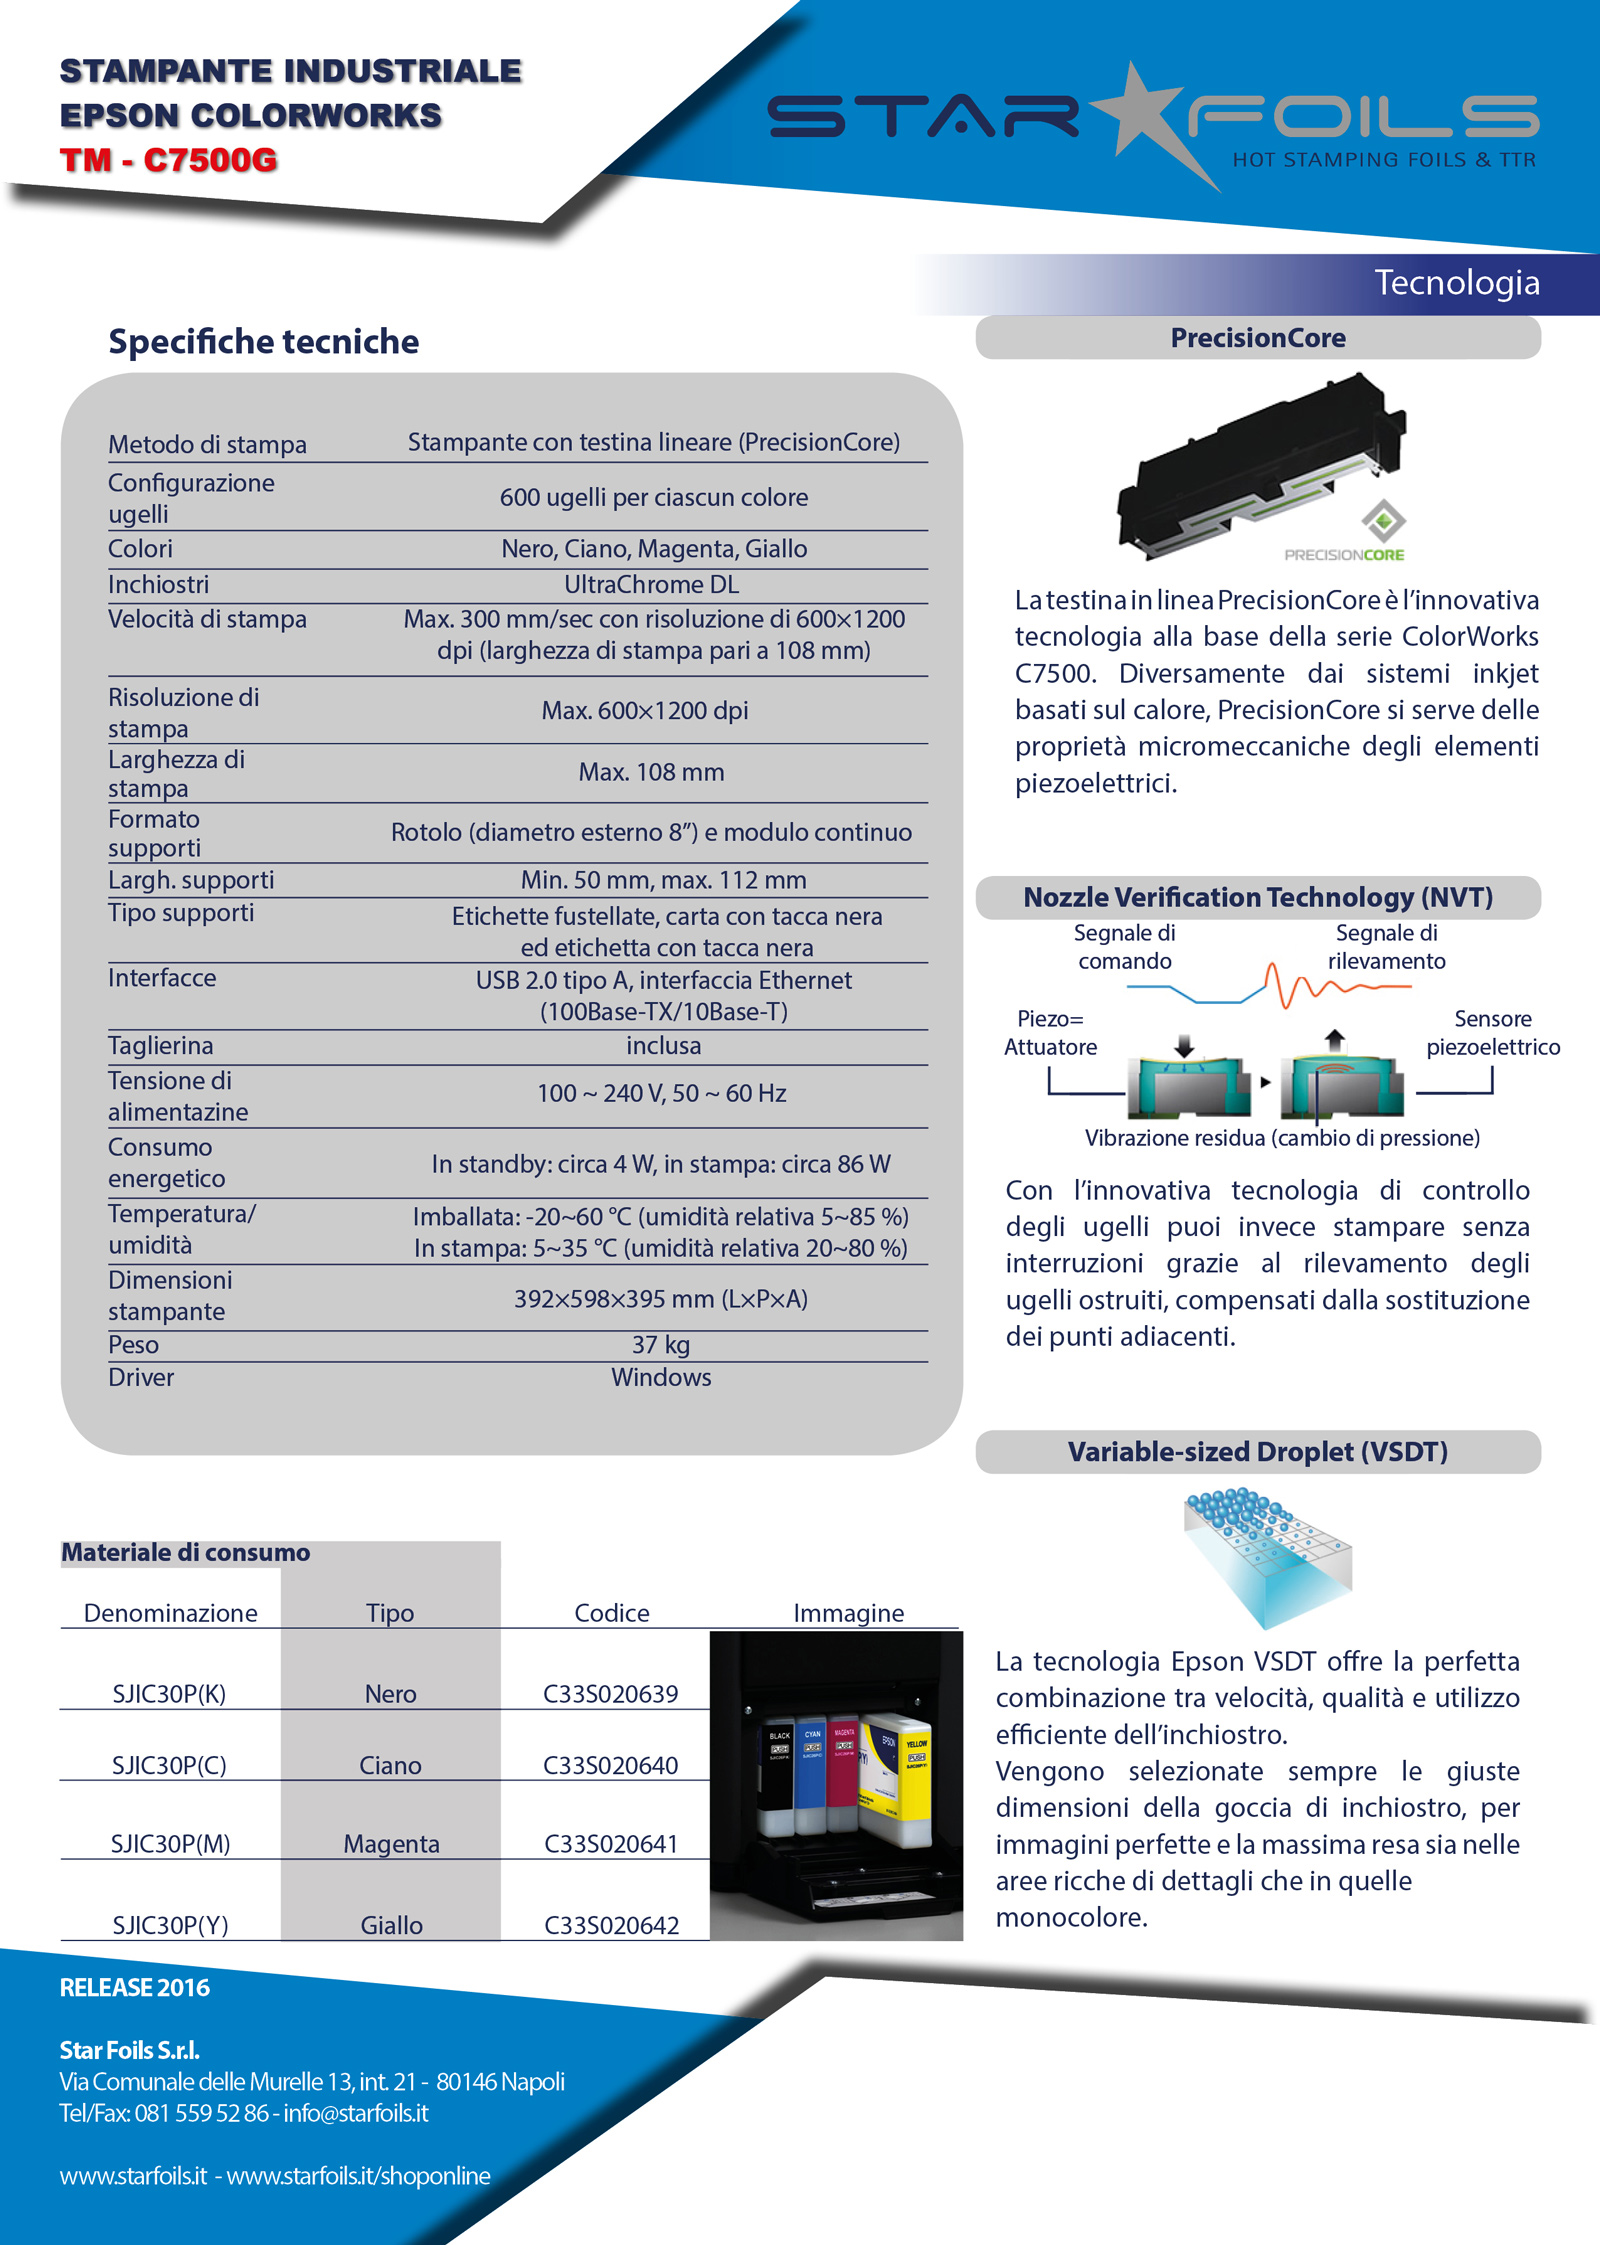 EPSON TM - C7500G_pag2